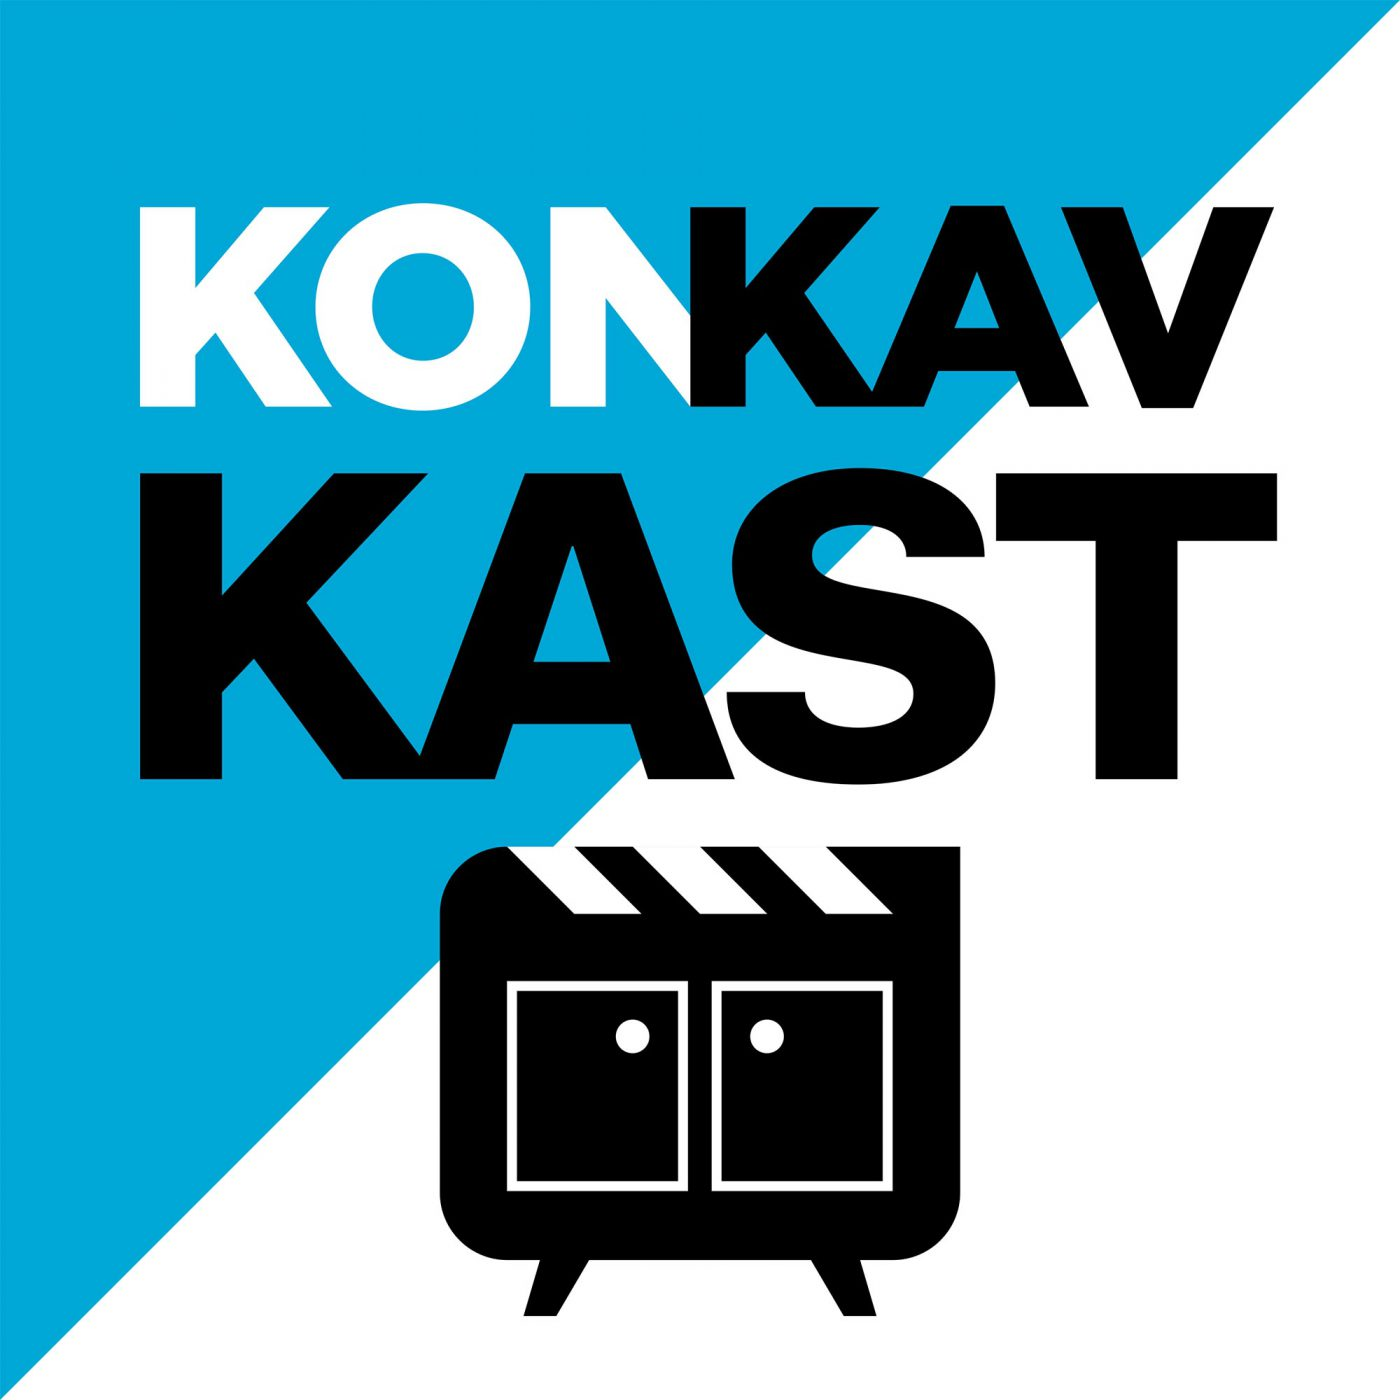 KonKav bkkc logo ontwerp JAgd 3